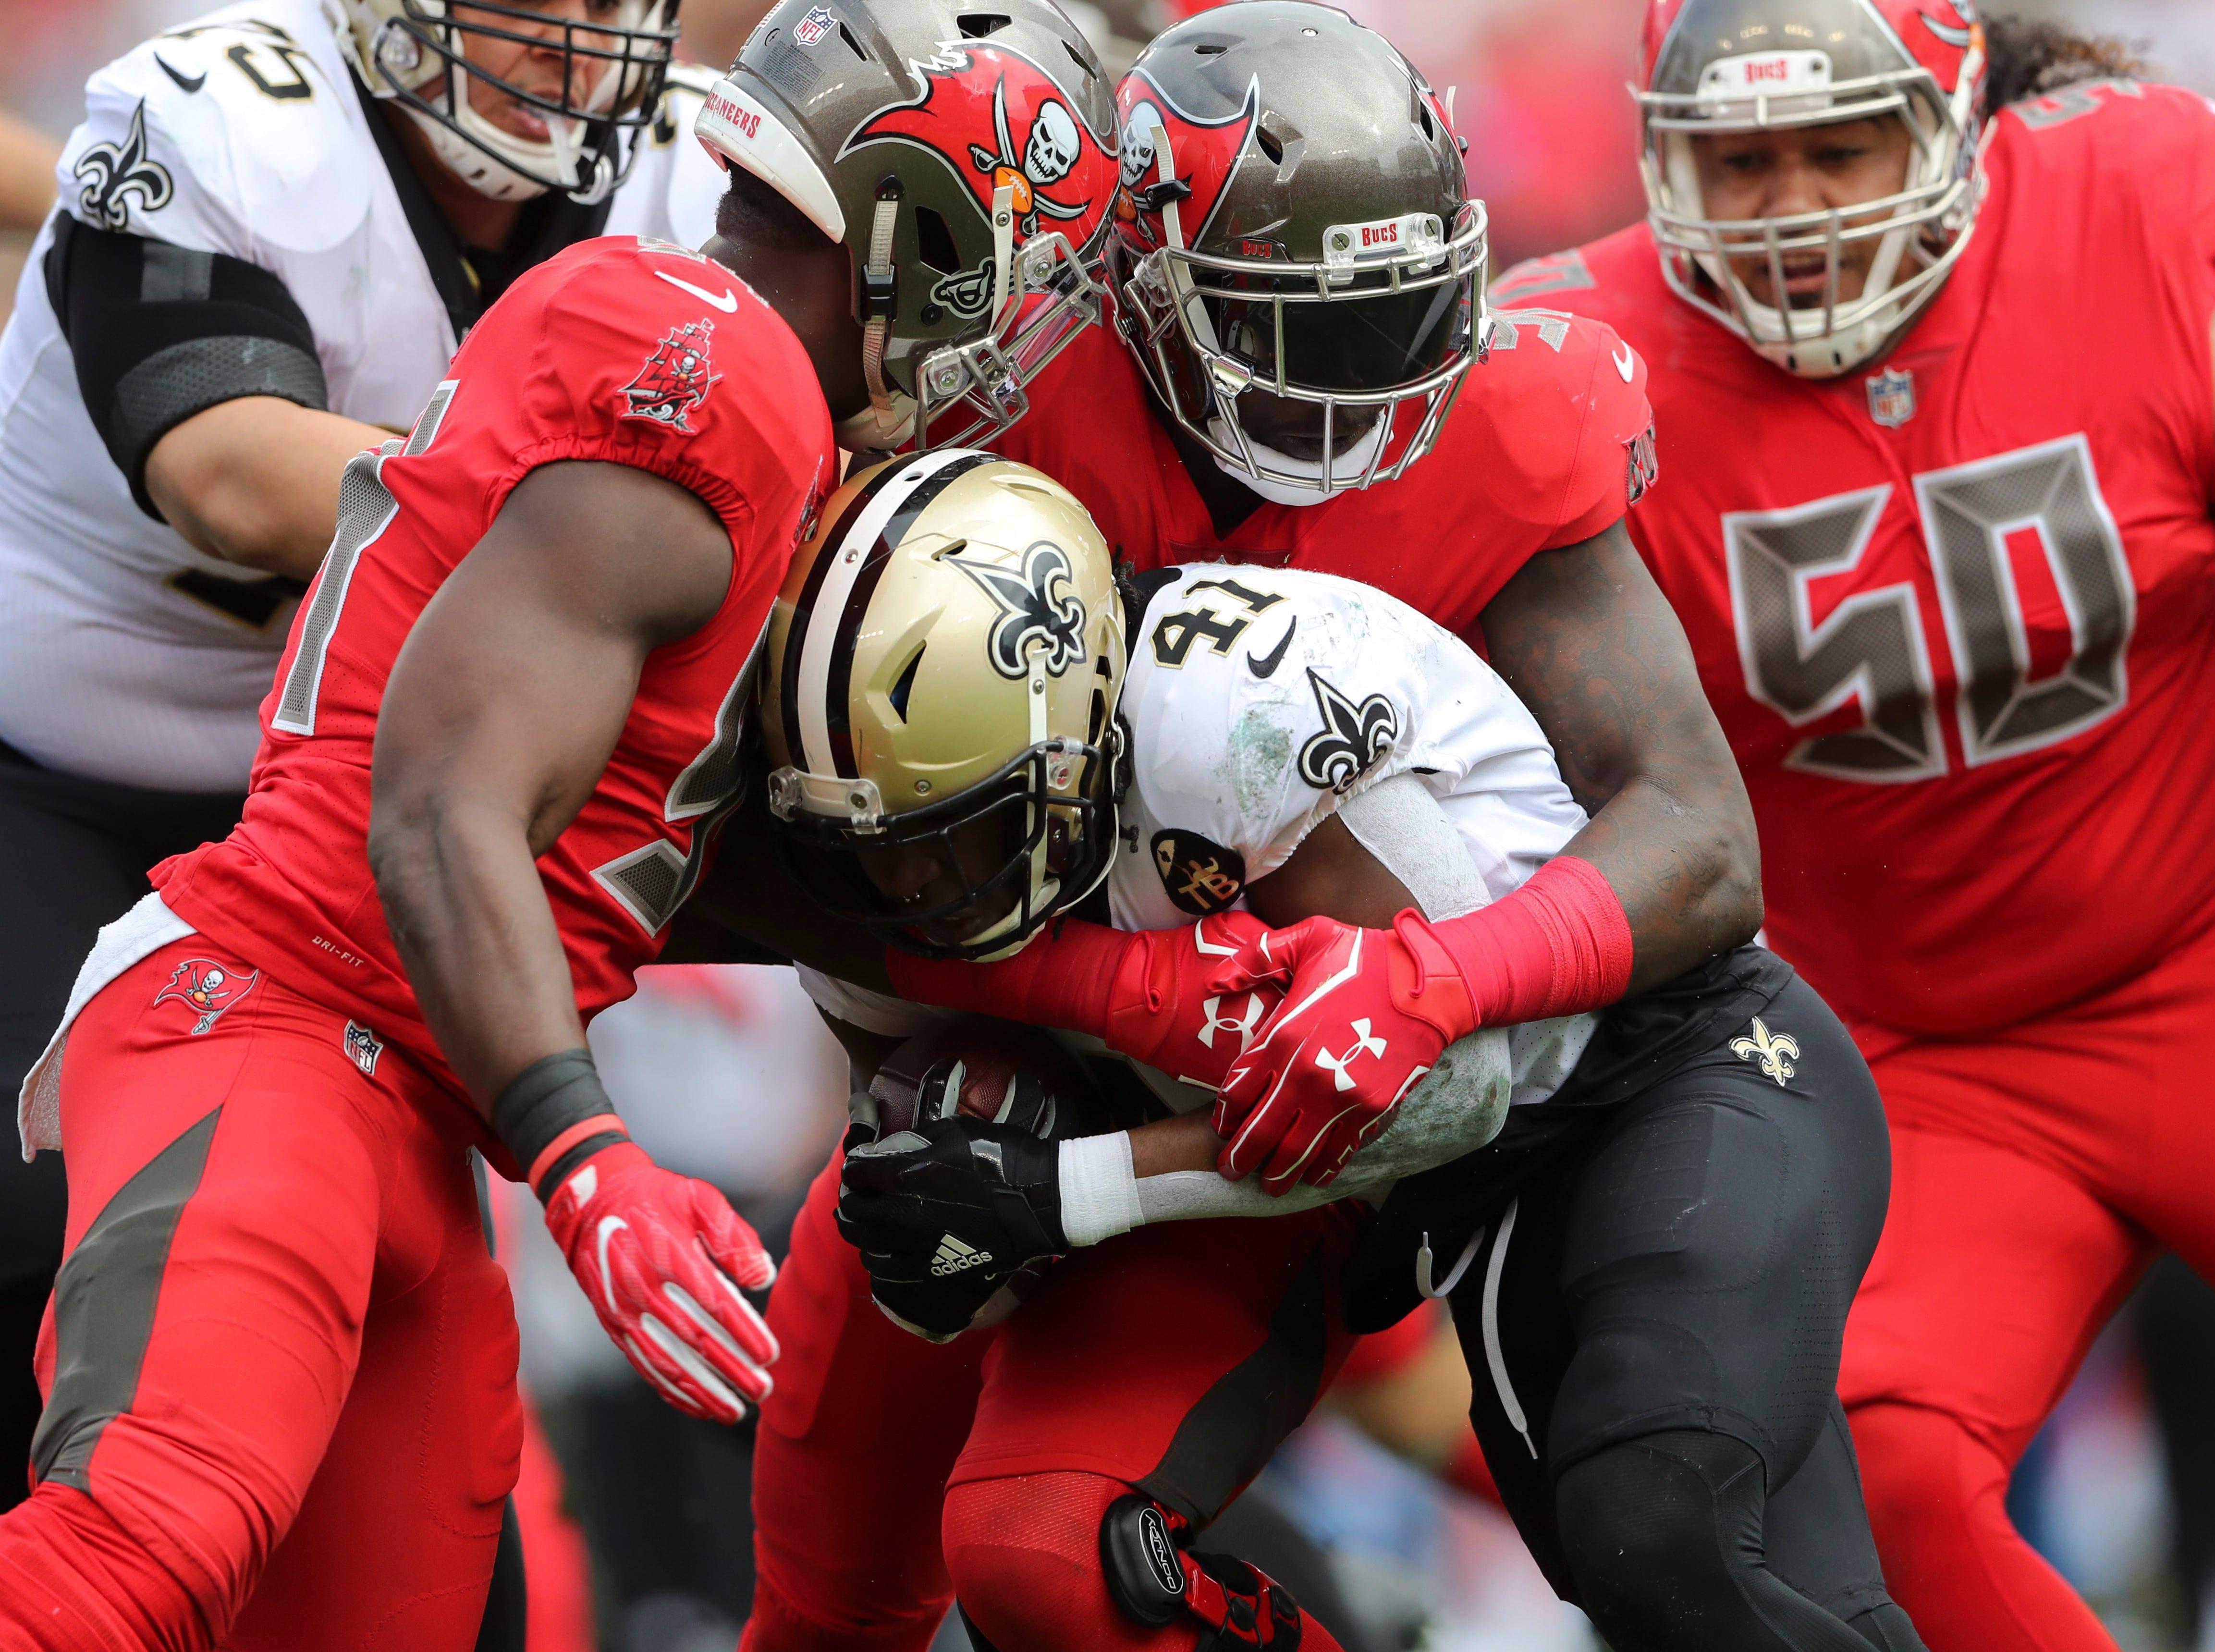 Saints running back Alvin Kamara is tackled against the Buccaneers.